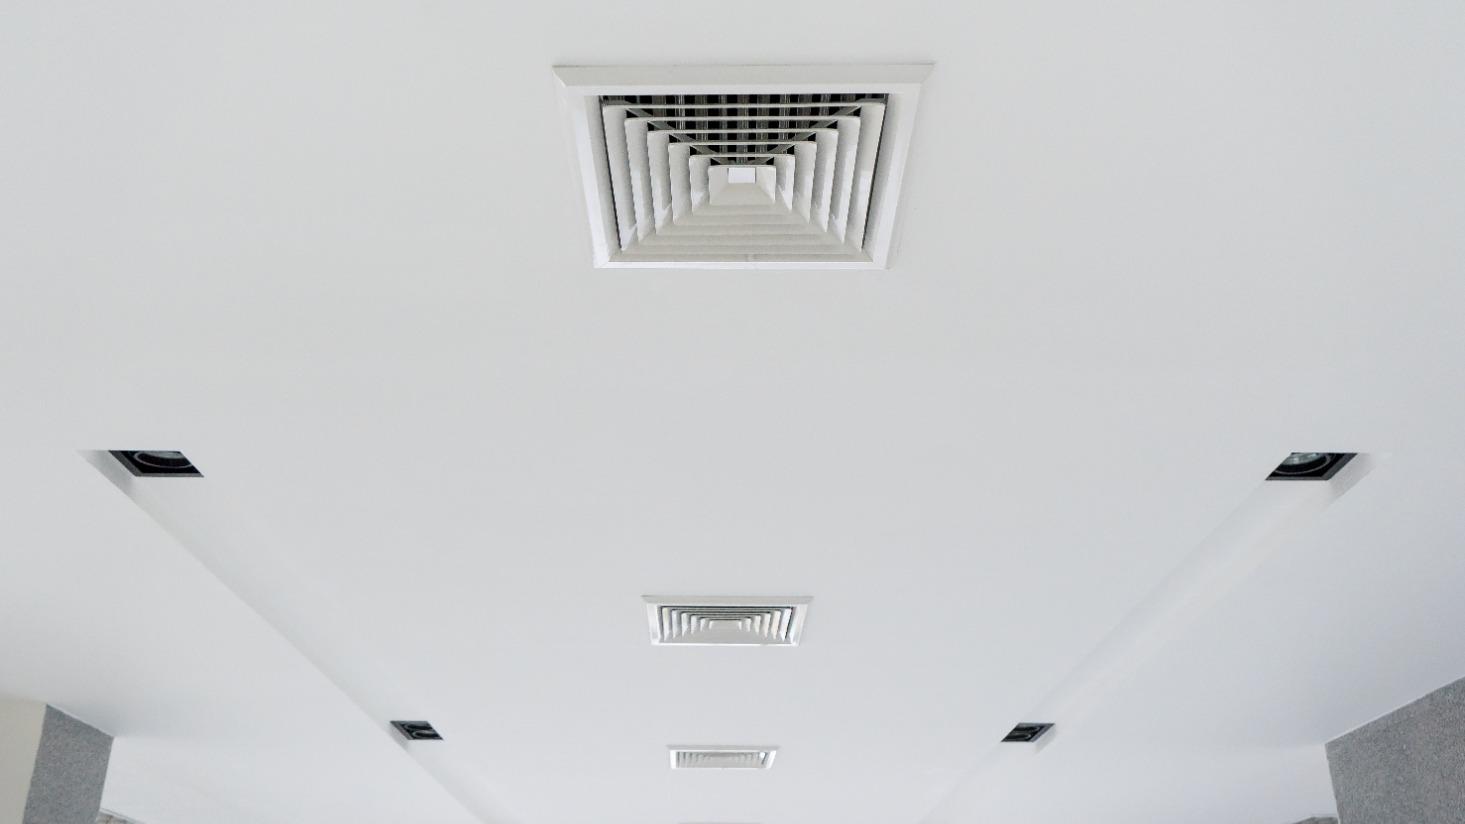 3 ways to improve Indoor Air Quality (IAQ)